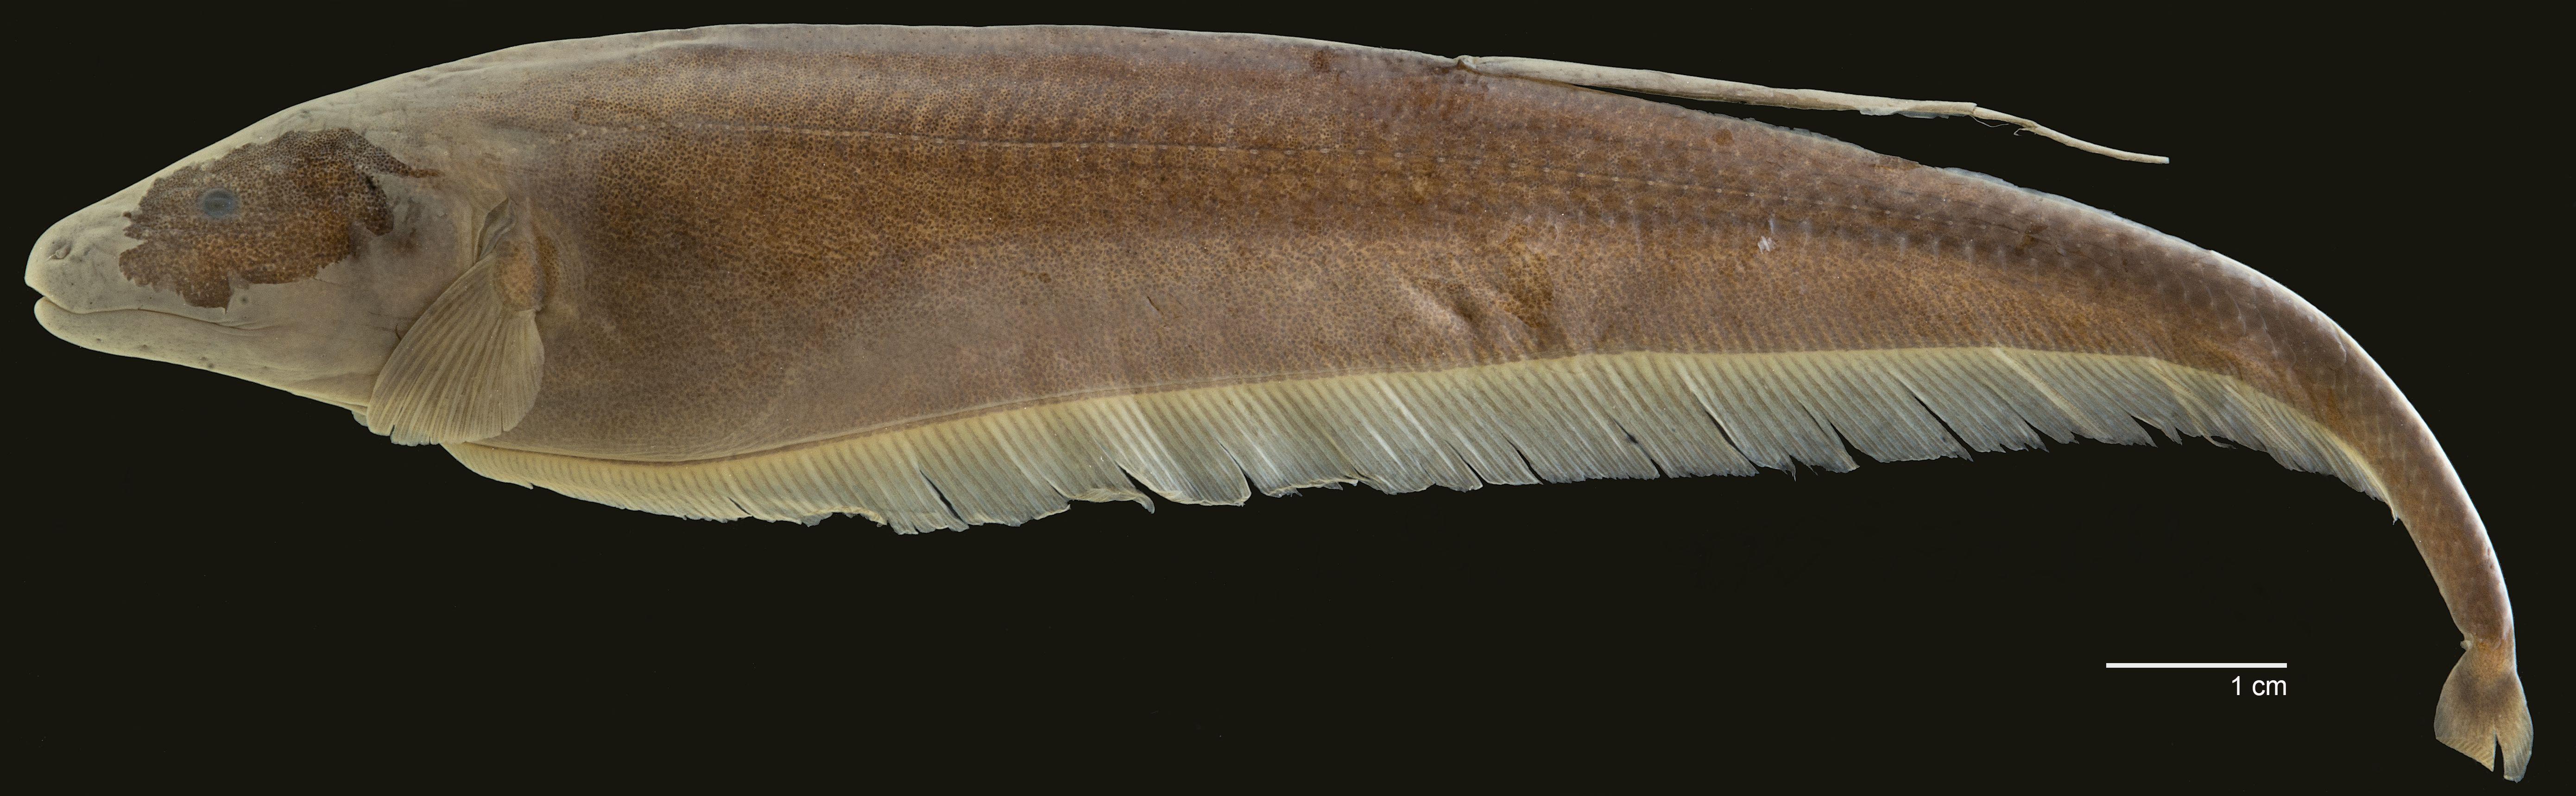 Holotípo de <em>Apteronotus milesi</em>, IAvH-P-3996_Lateral, 160.4 mm TL (scale bar = 1 cm). Photograph by S. J. Raredon